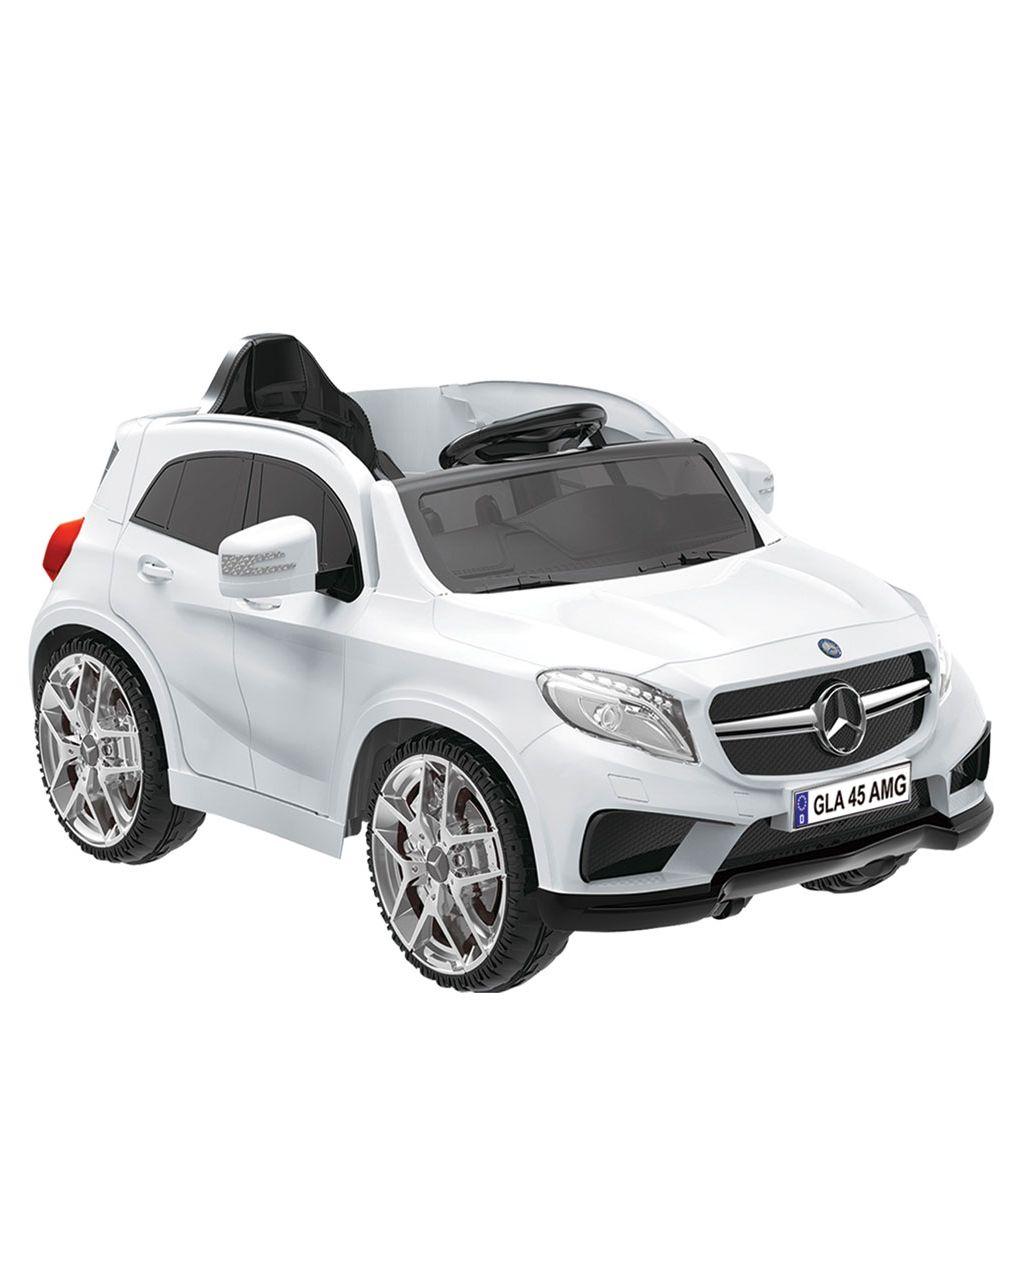 Mercedes gla bianco 12 volt - Giaquinto